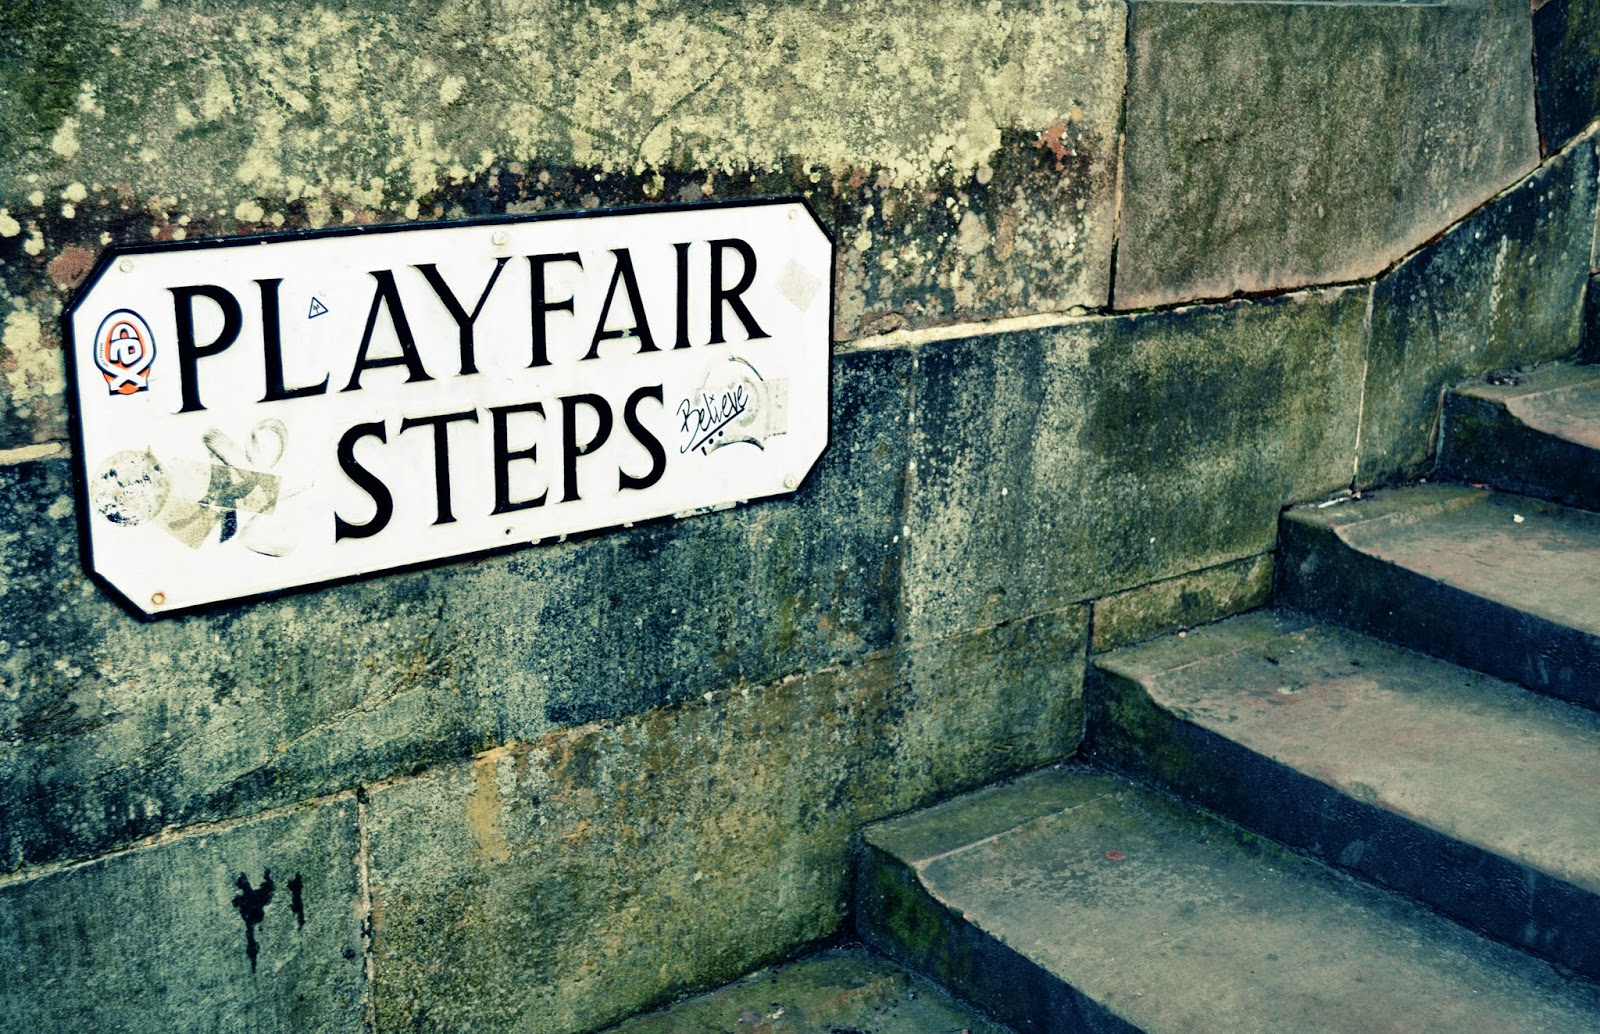 Edinburgh, Scotland, murder, fiction, playfair steps, Irvine Welsh, Filth, review, book, literature, contemporary